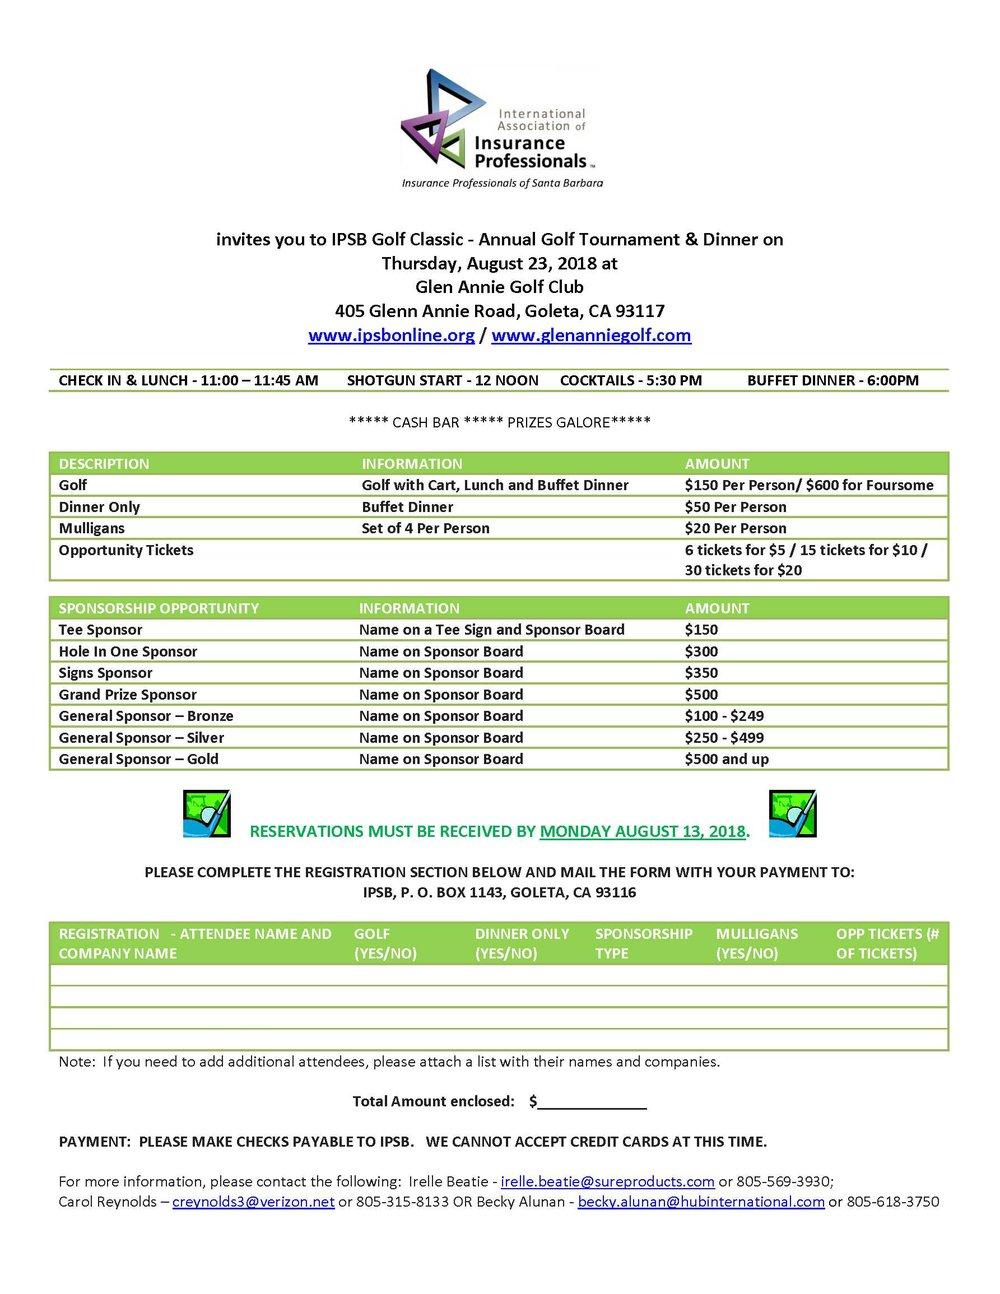 2018 IPSB Golf Classic Invitation and Registration Form.jpg